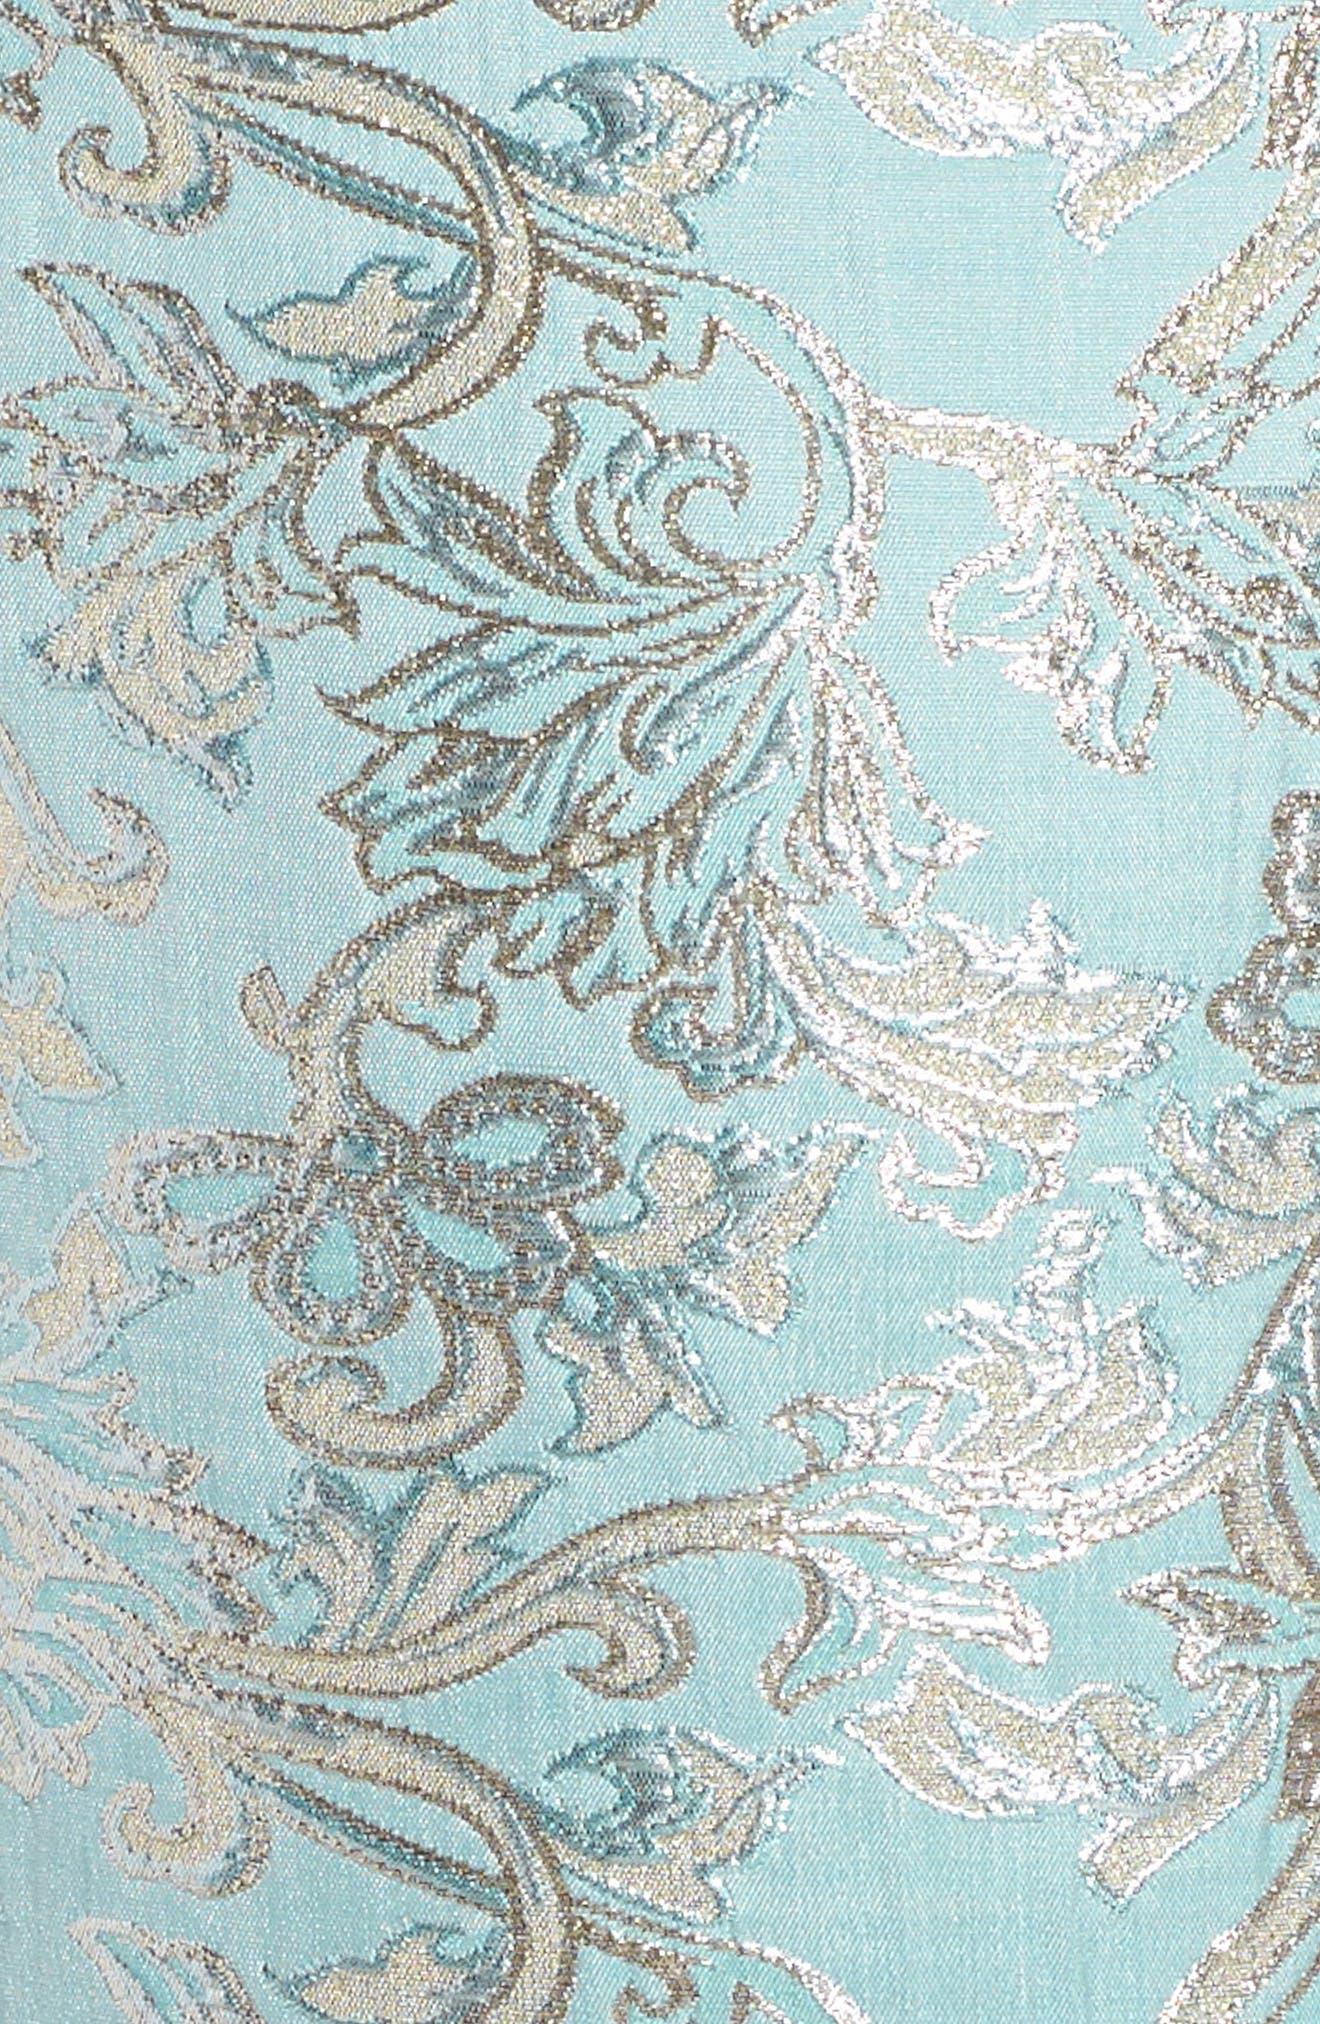 Floral Brocade Dress,                             Alternate thumbnail 4, color,                             440